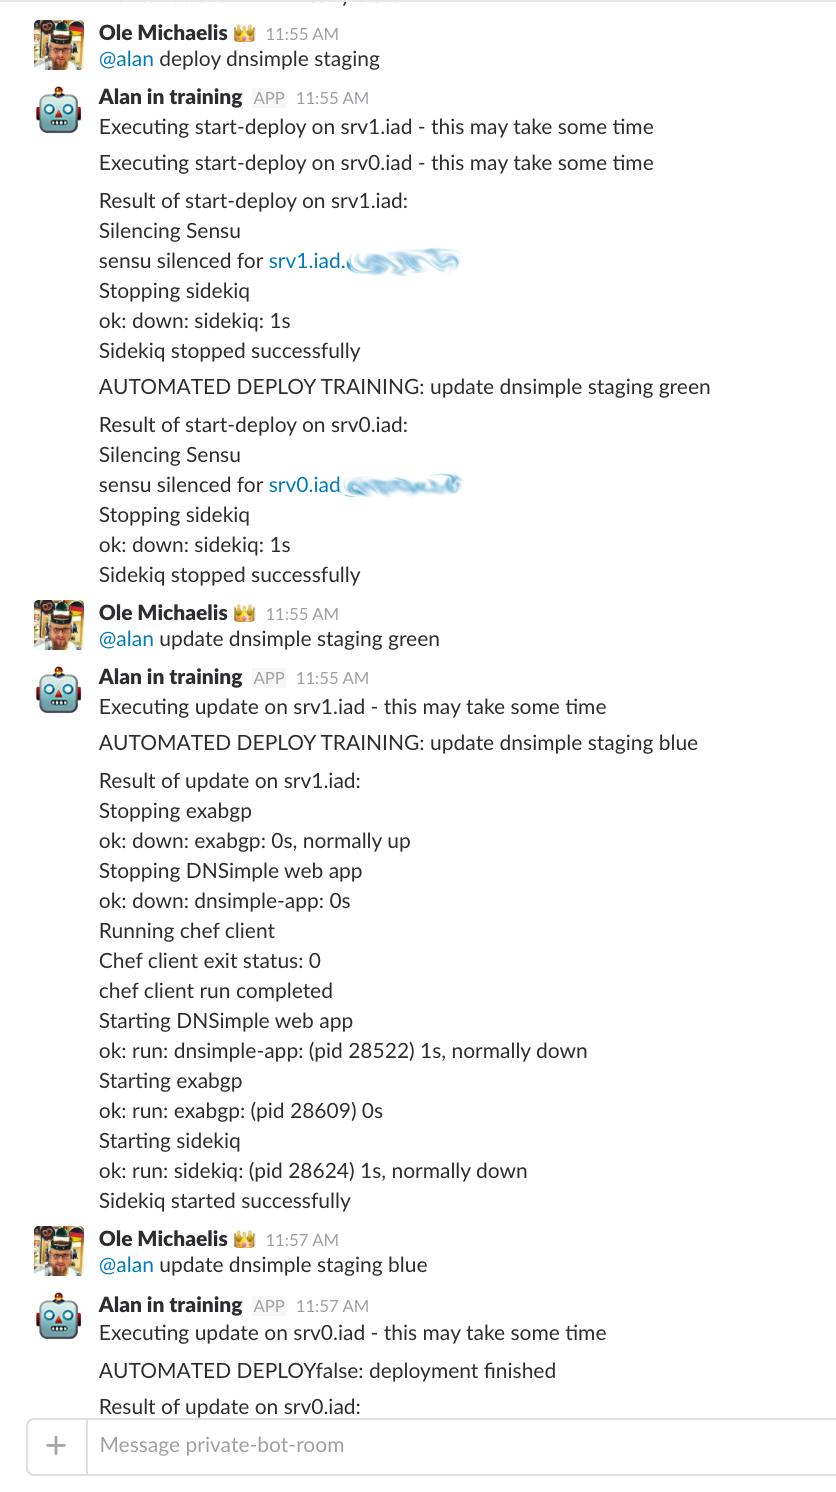 Screenshot showing the old manual deploy in Slack